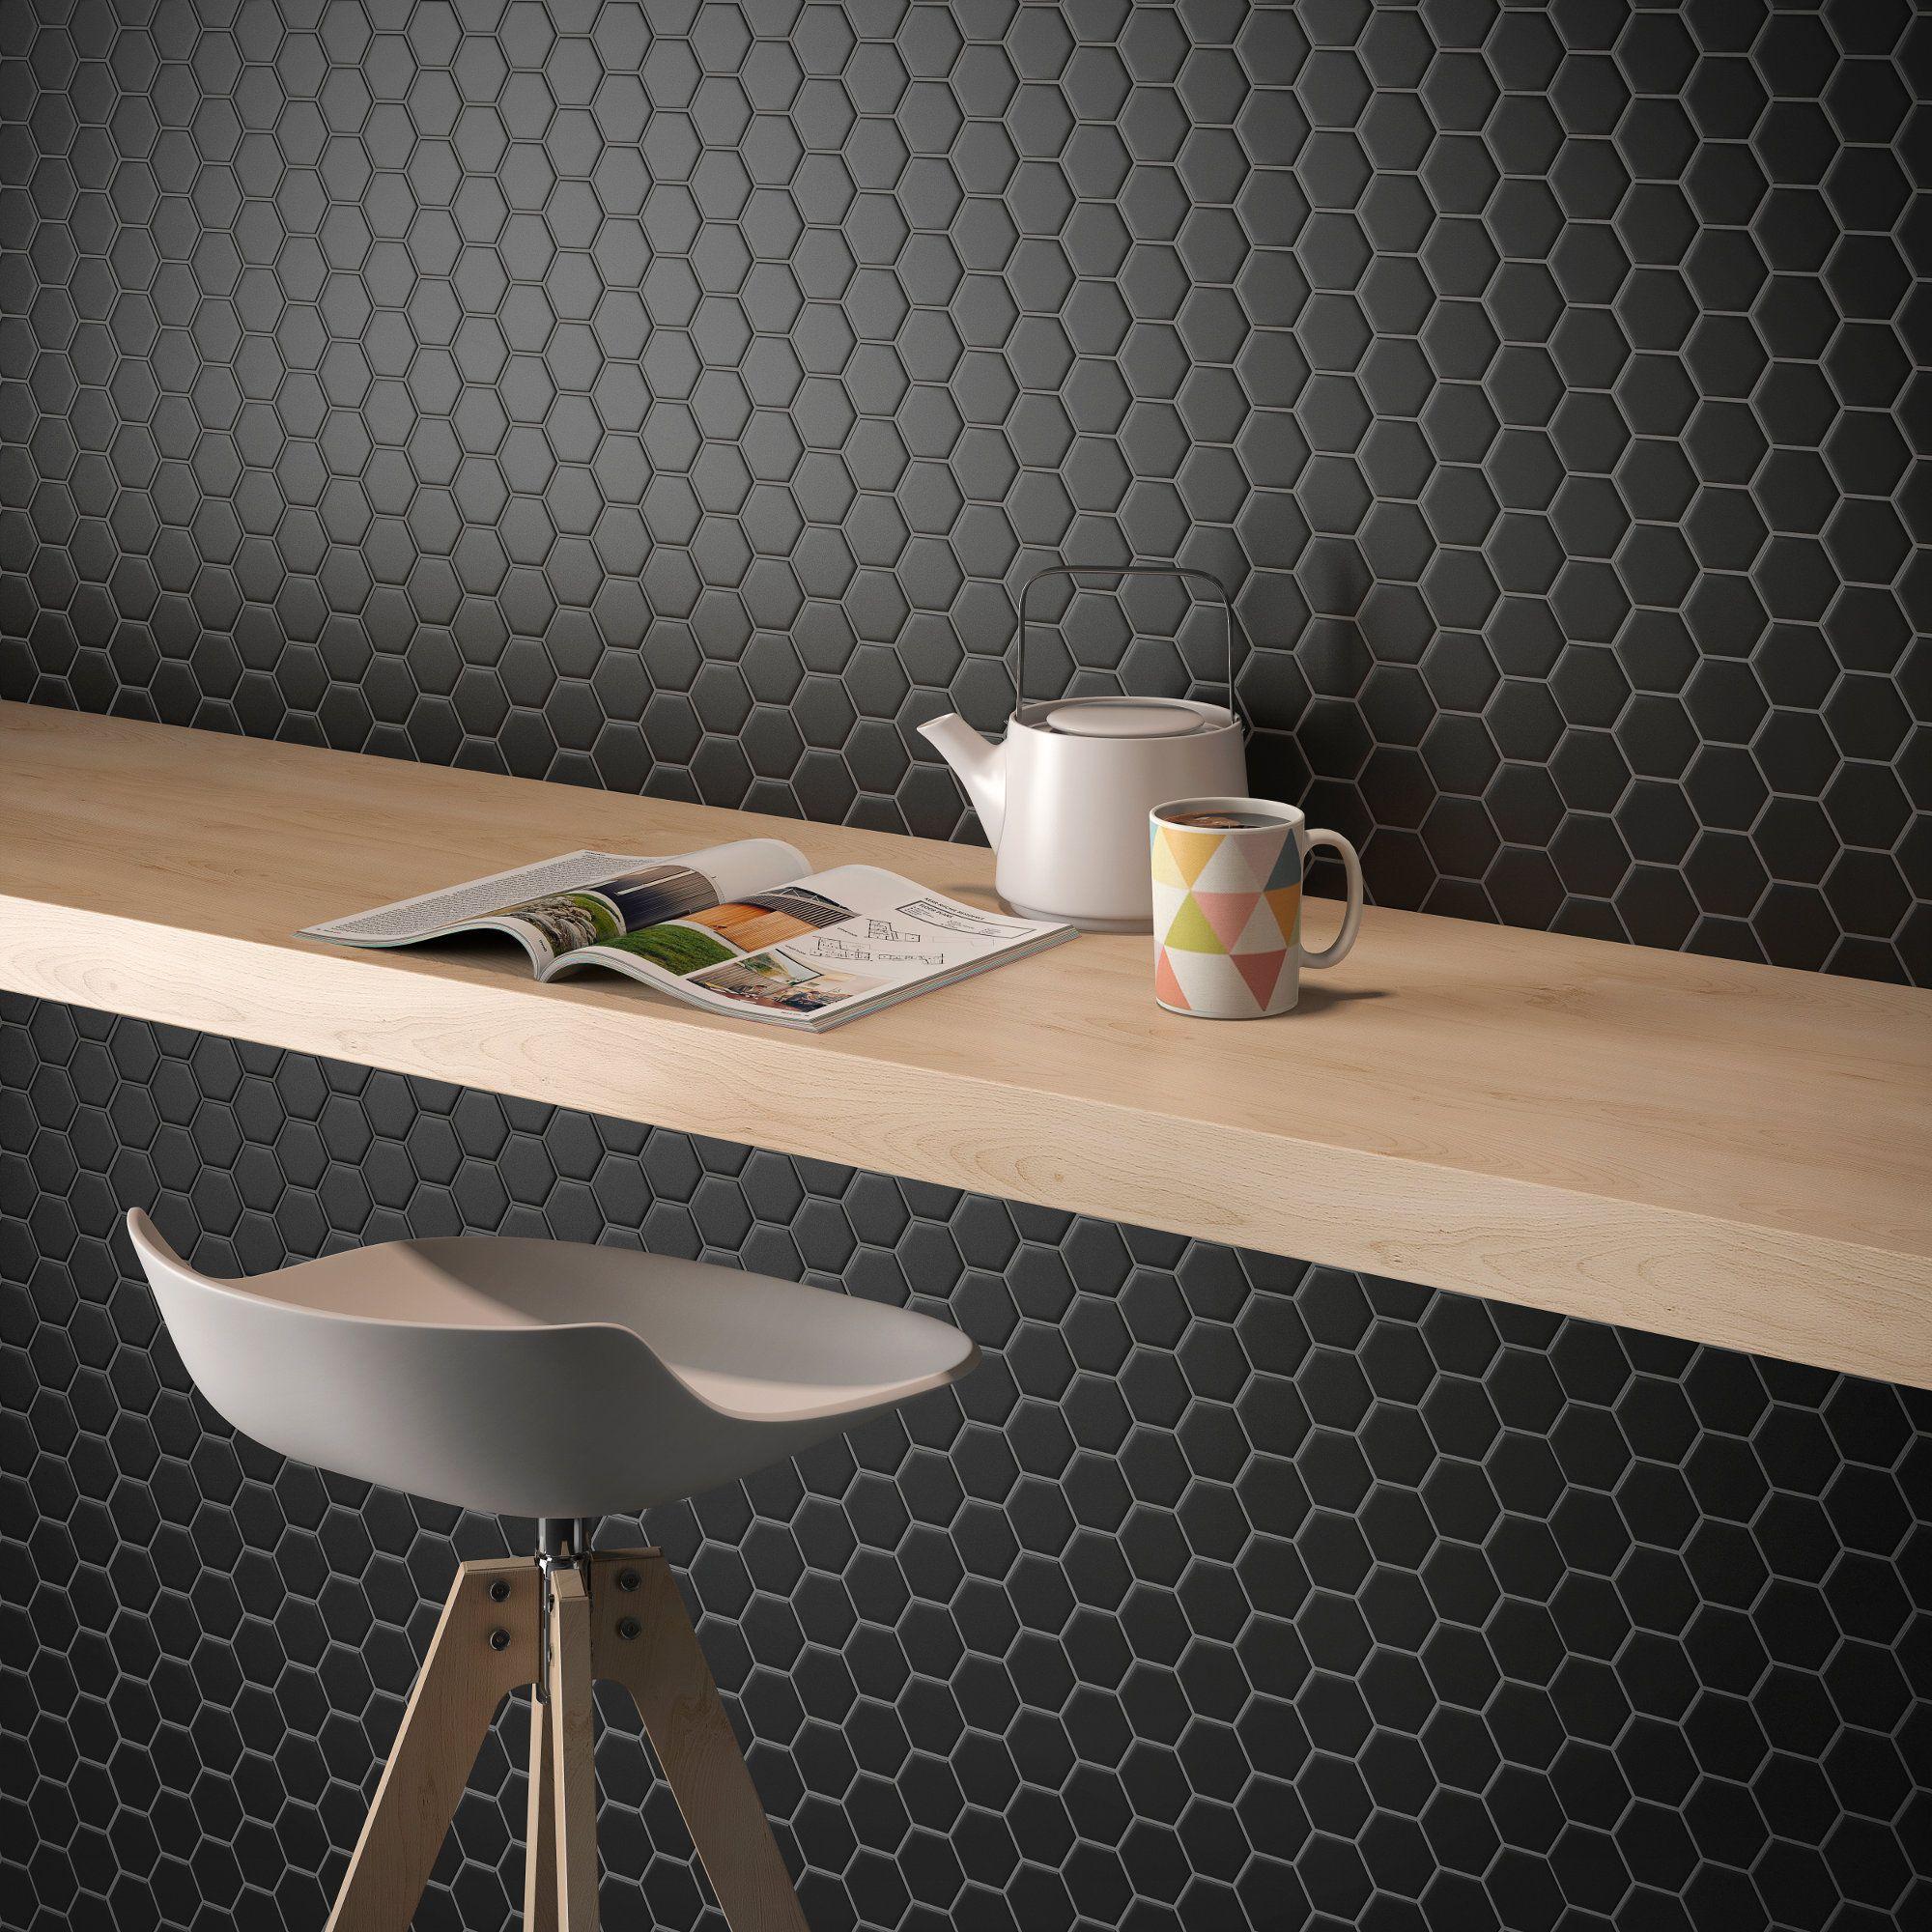 Ceramic Tile Cc Mosaics Glazed Porcelain Characteristics